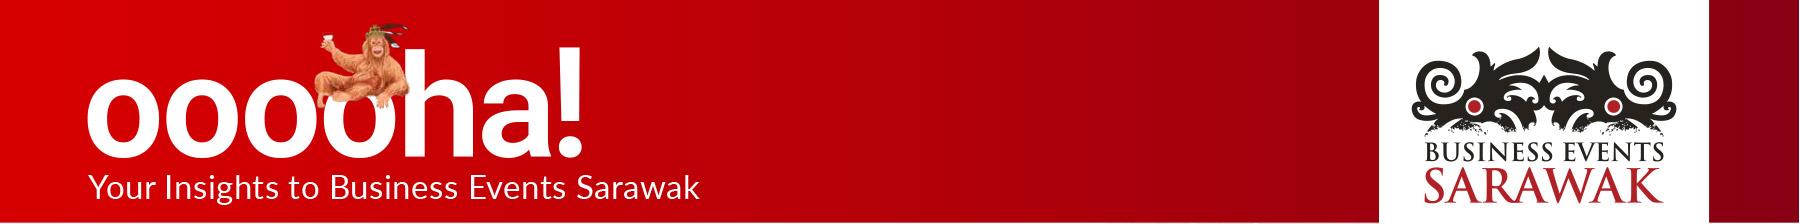 BESarawak Industry Related News – May 2021